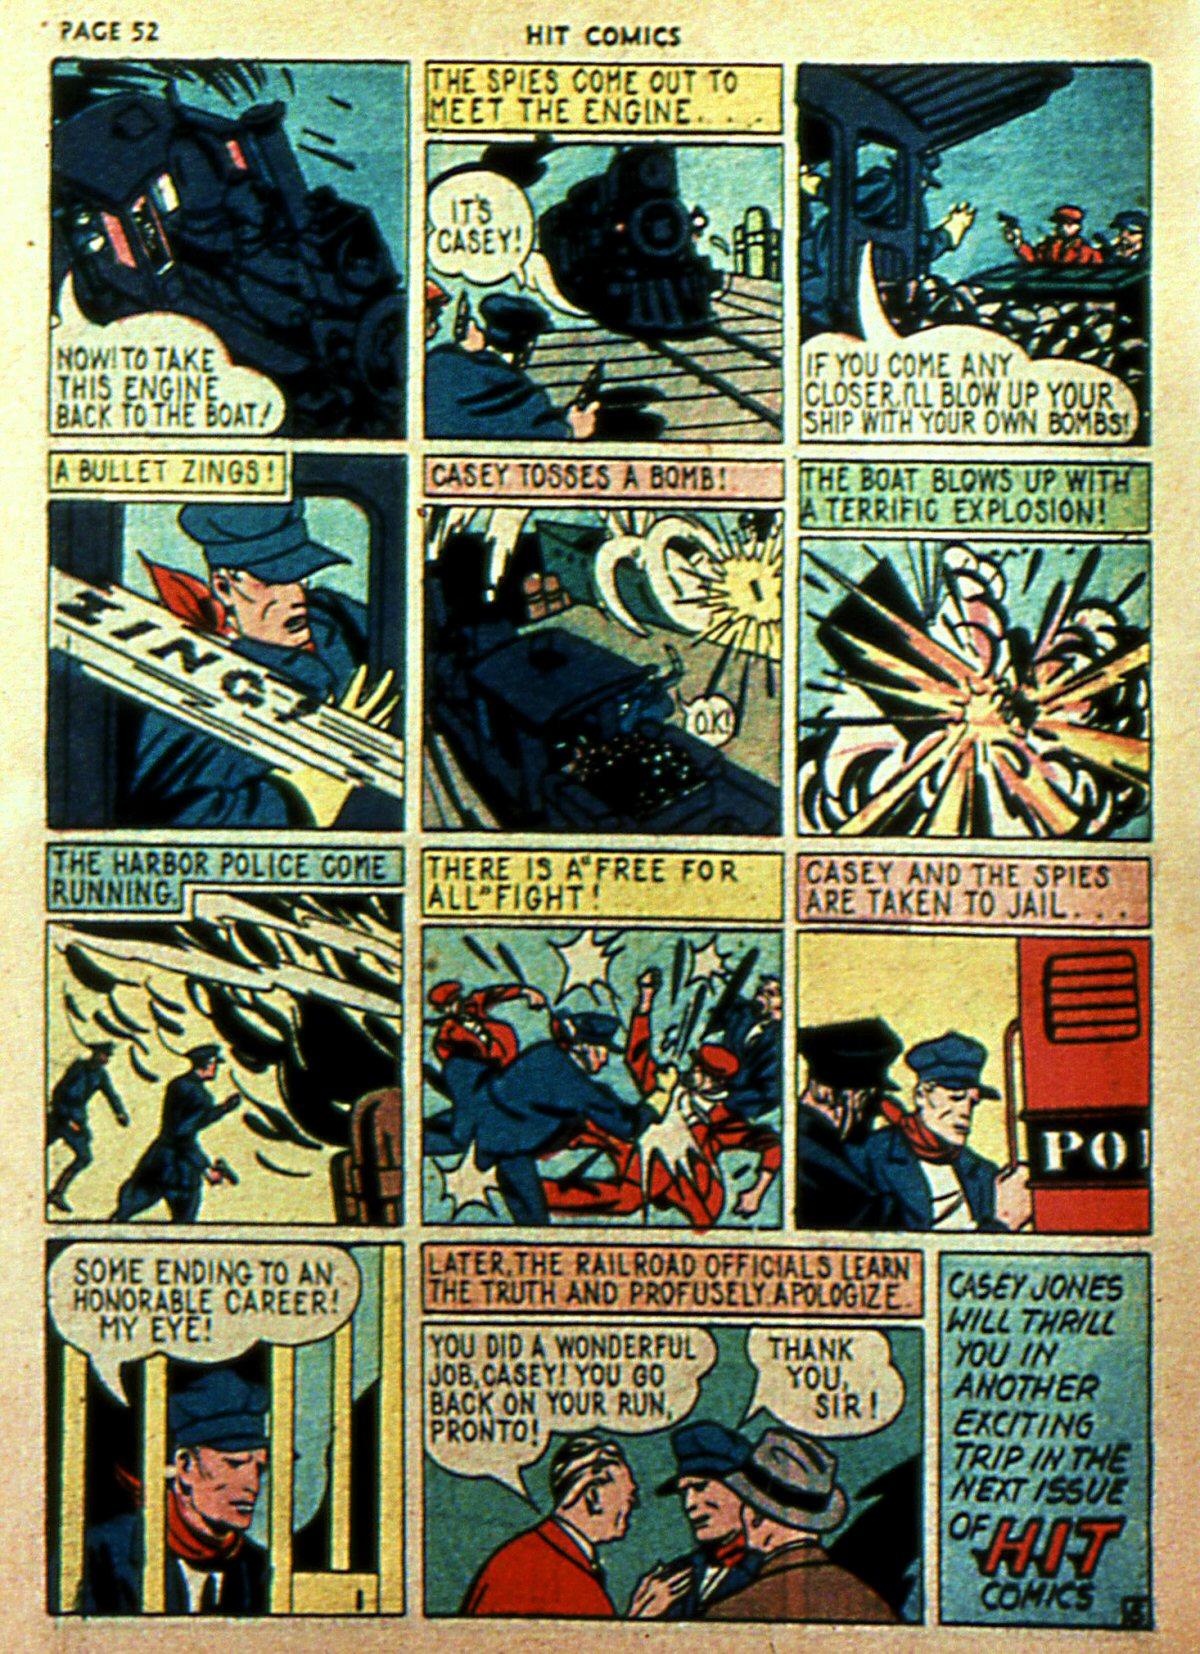 Read online Hit Comics comic -  Issue #2 - 54